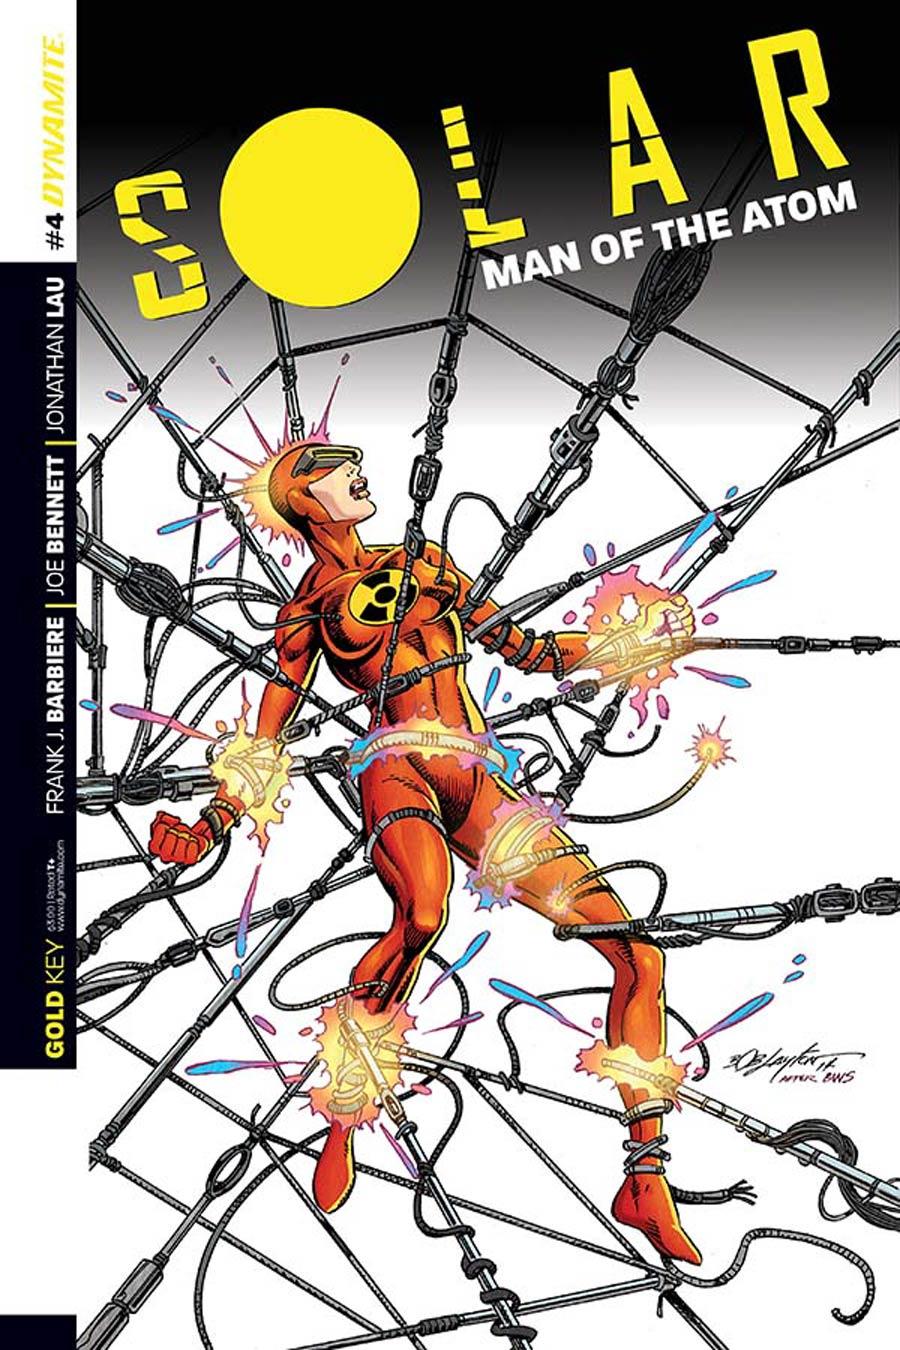 Solar Man Of The Atom Vol 2 #4 Cover B Variant Bob Layton Subscription Cover